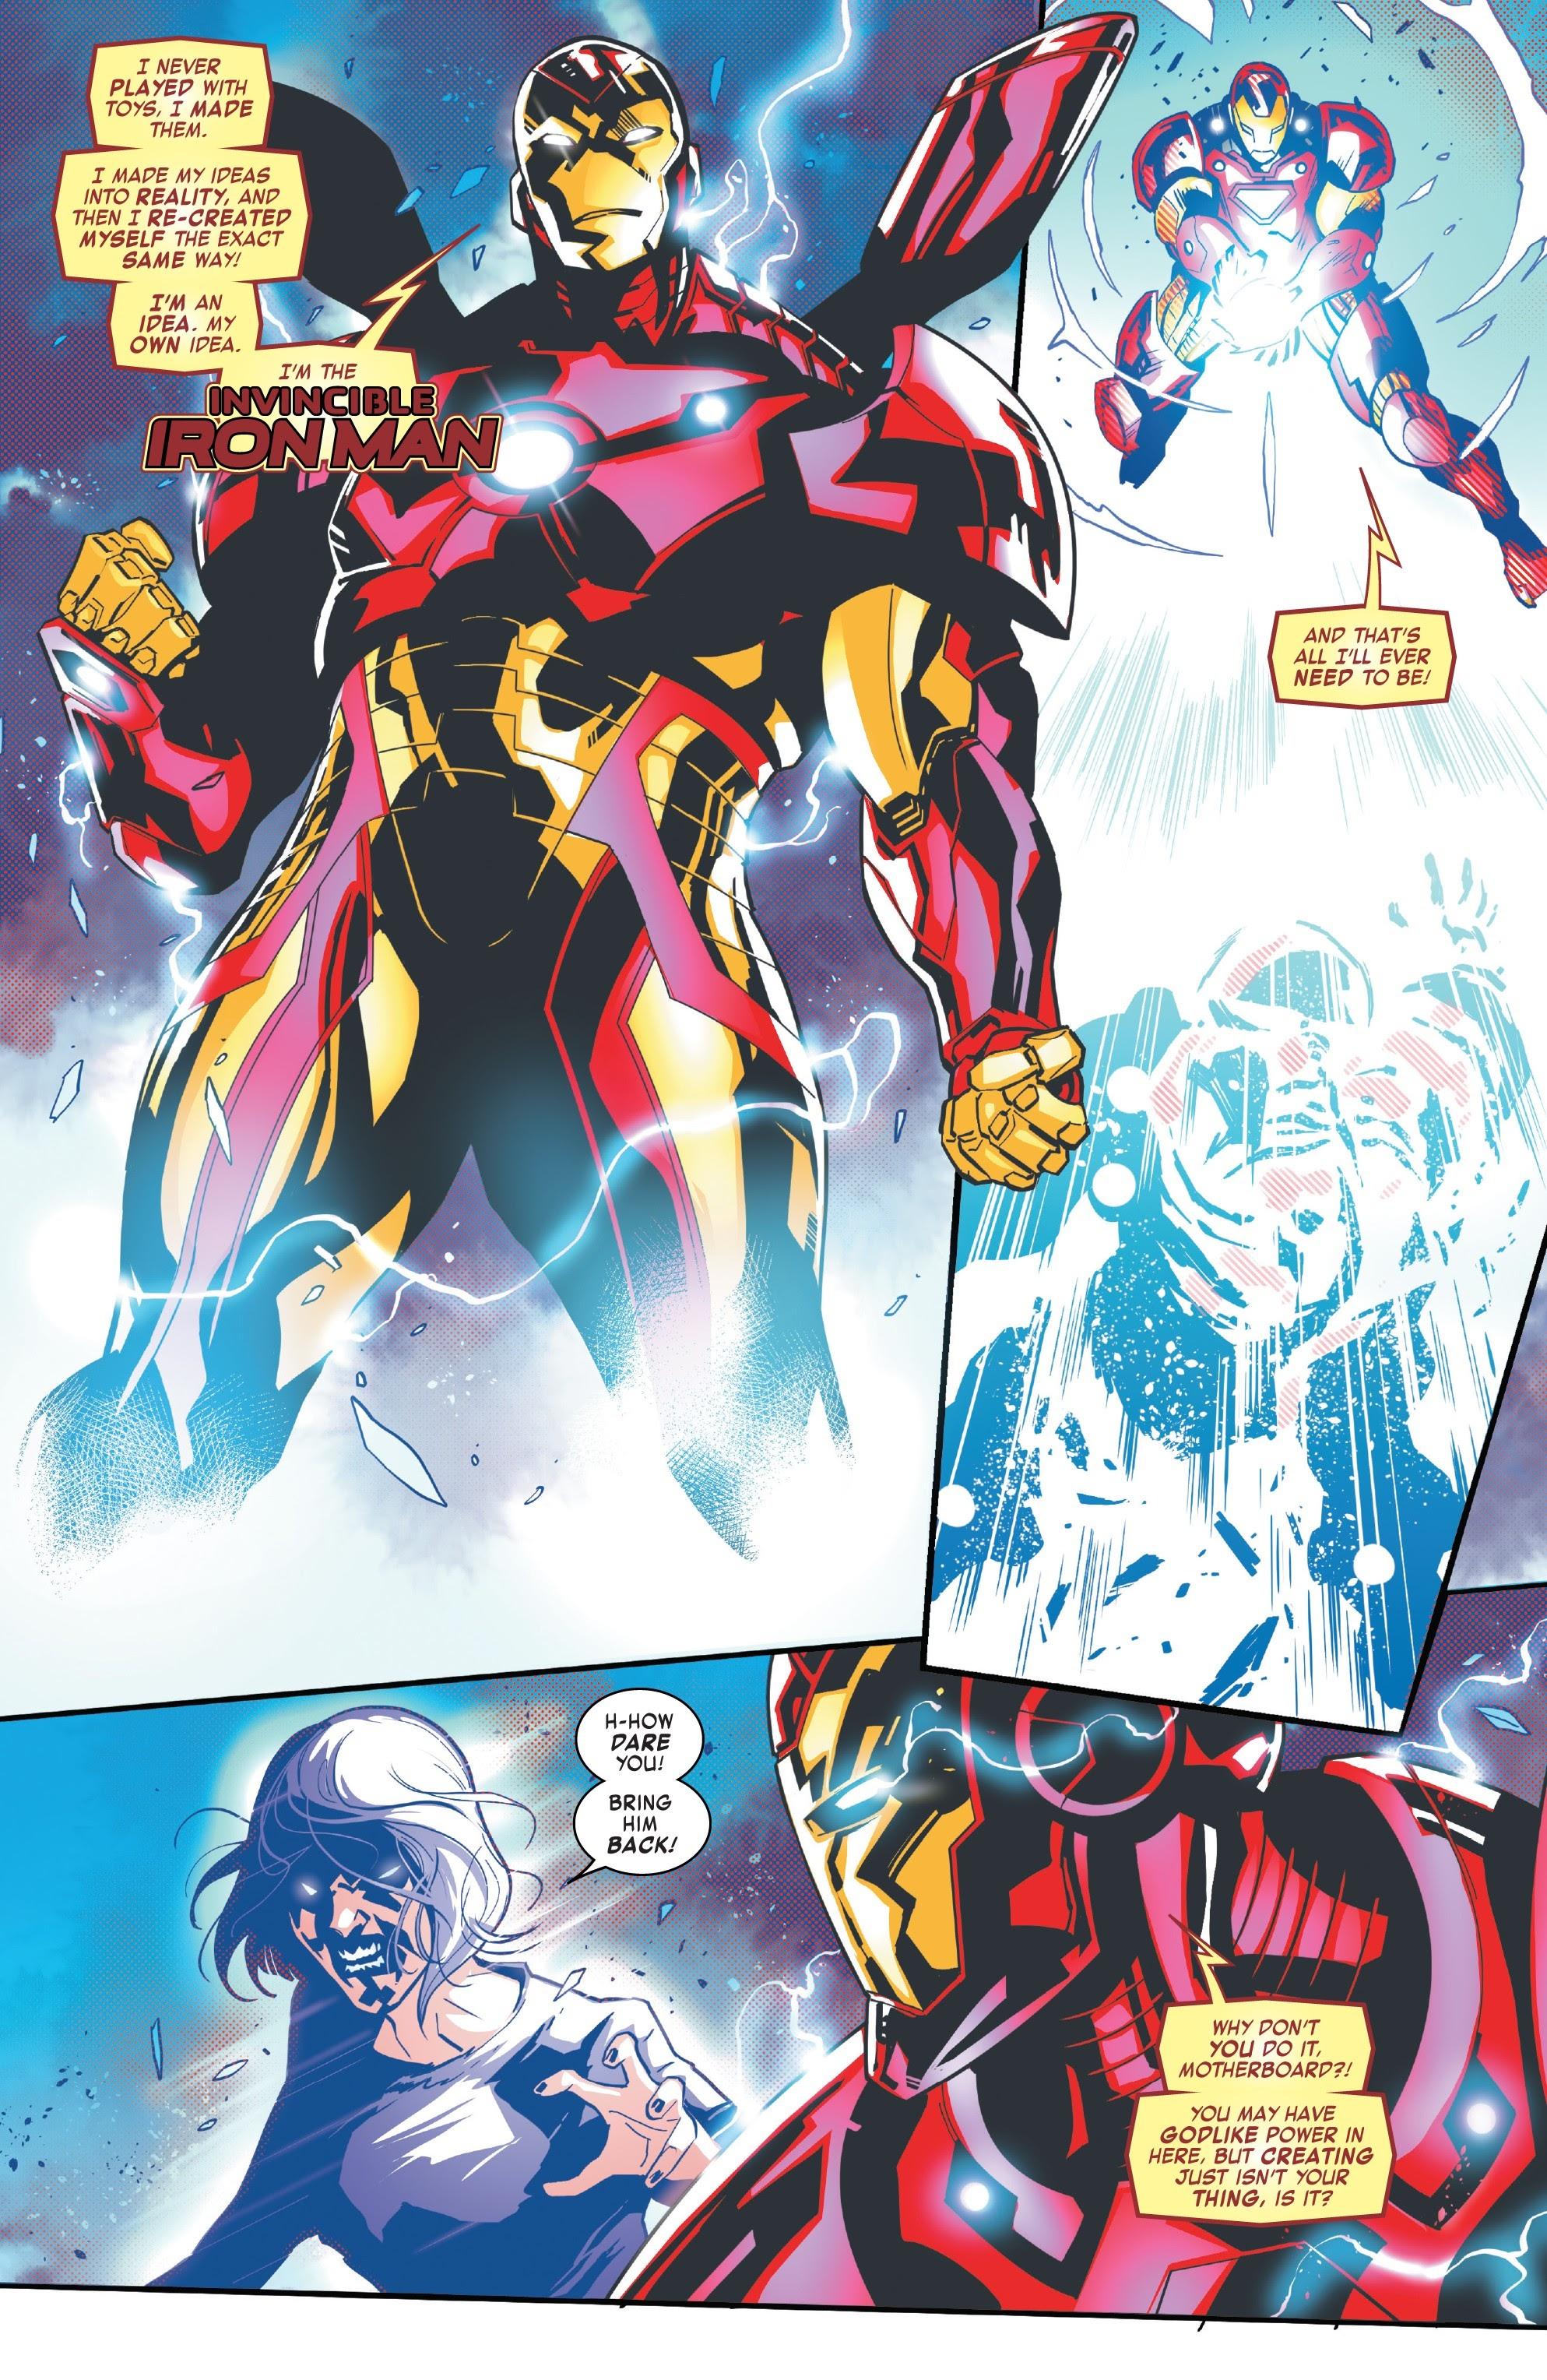 Read online Tony Stark: Iron Man comic -  Issue #10 - 17